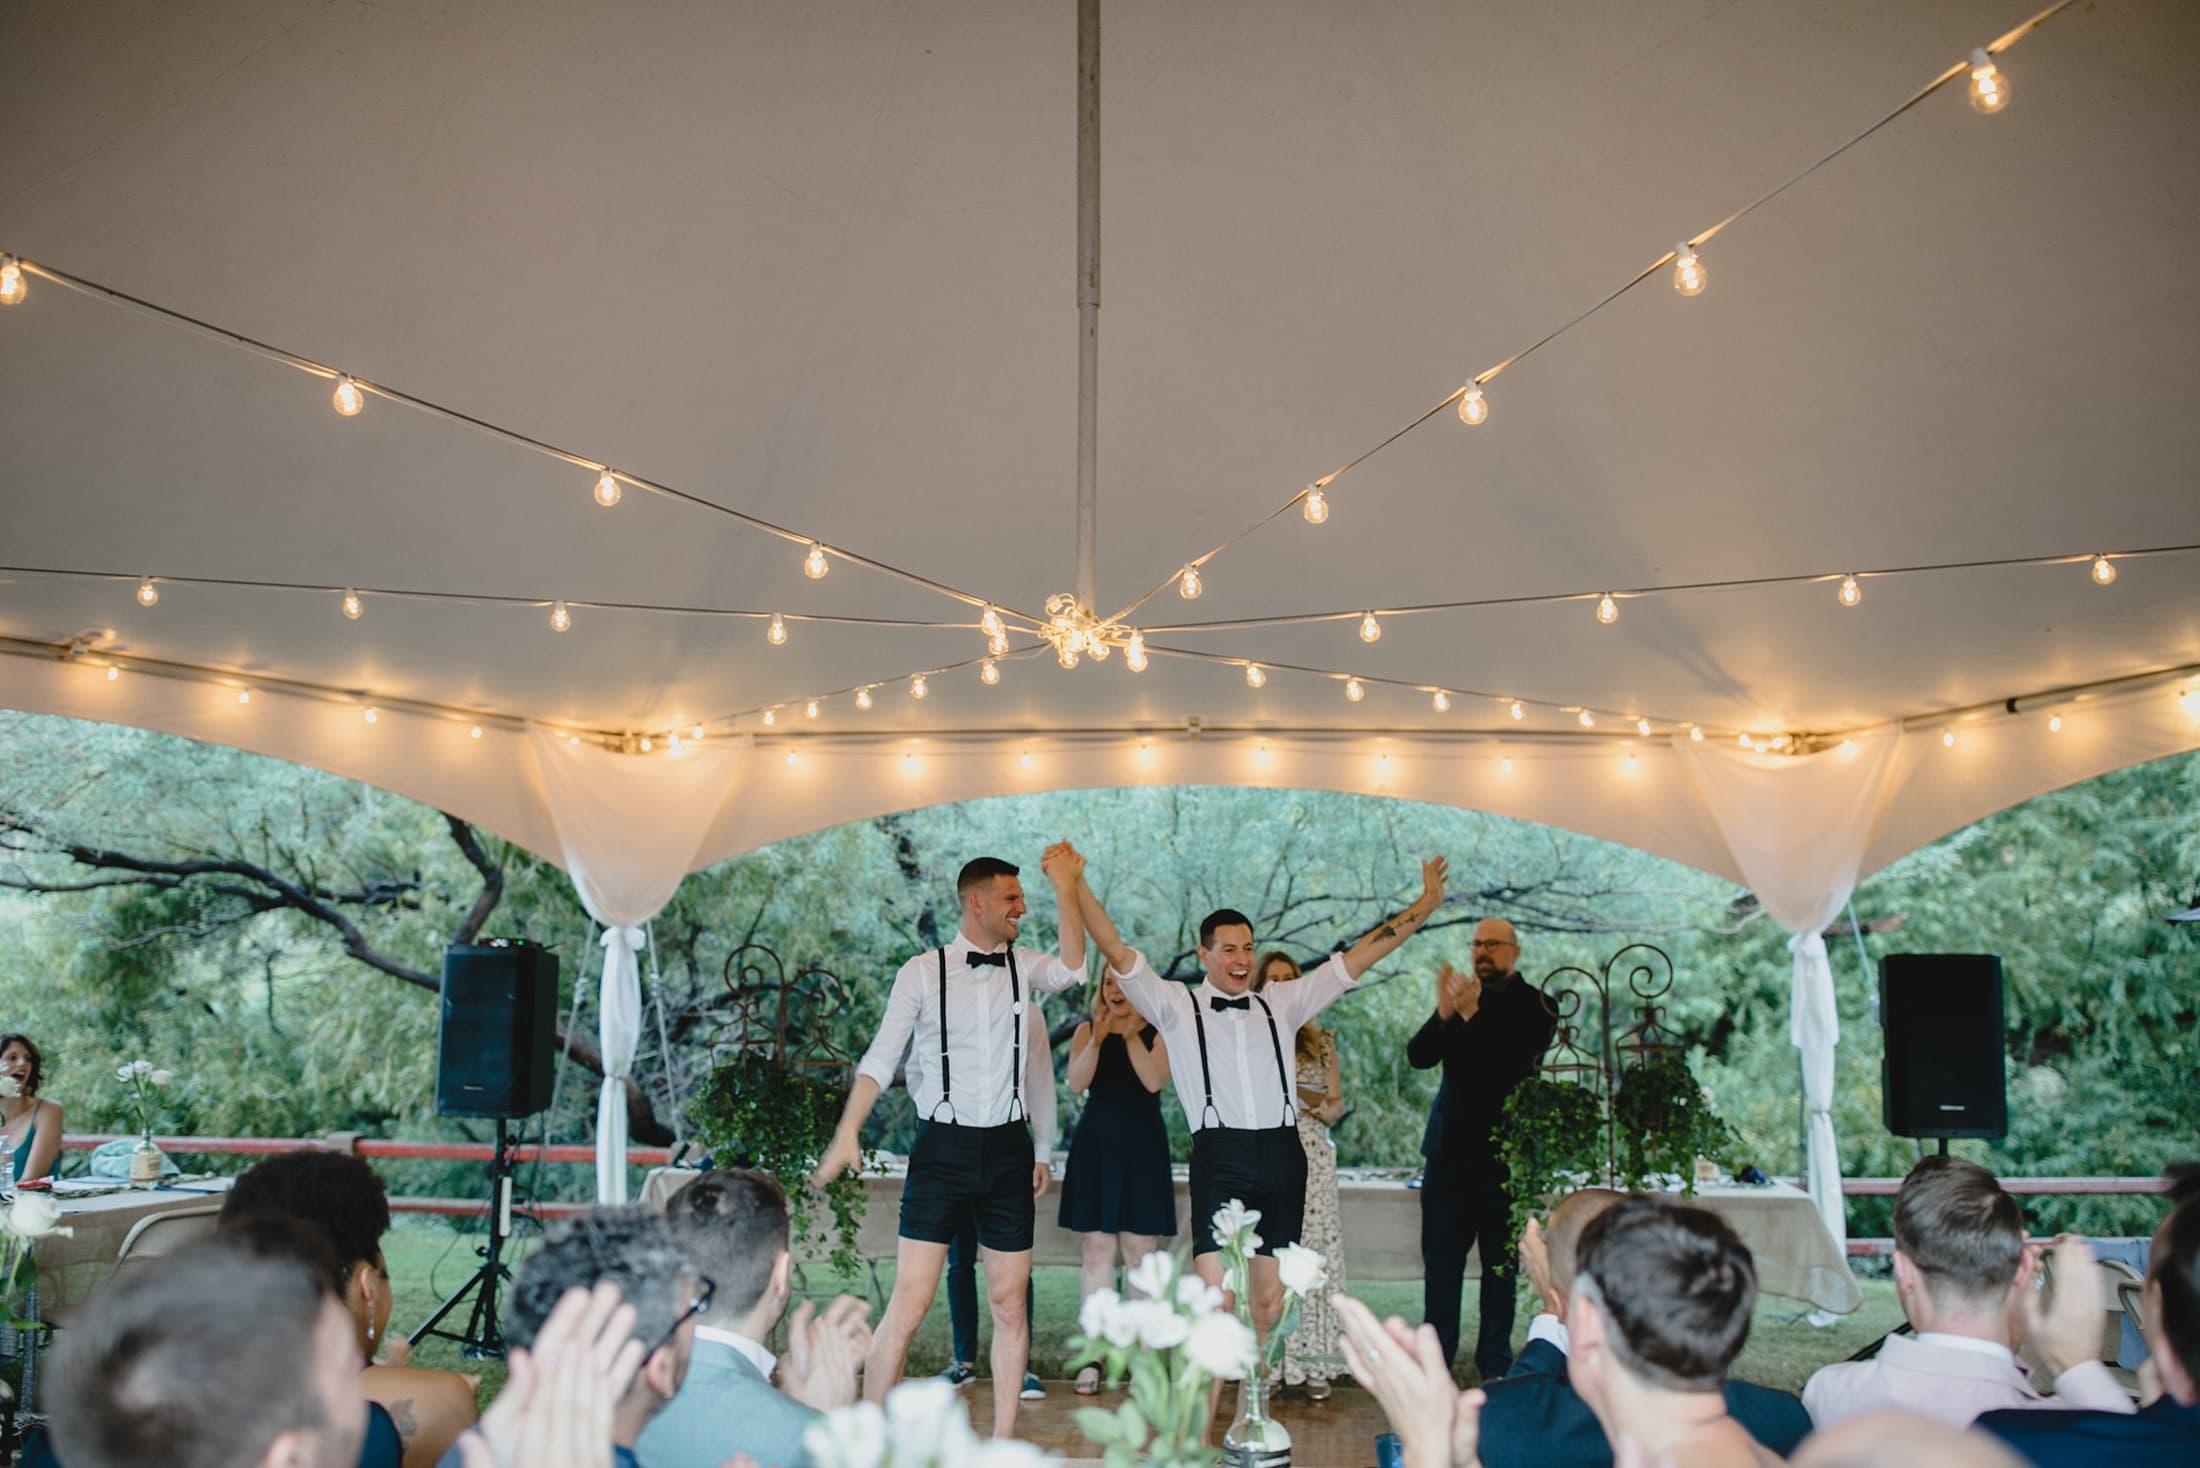 Saguaro Lake Ranch tented ceremony gay wedding